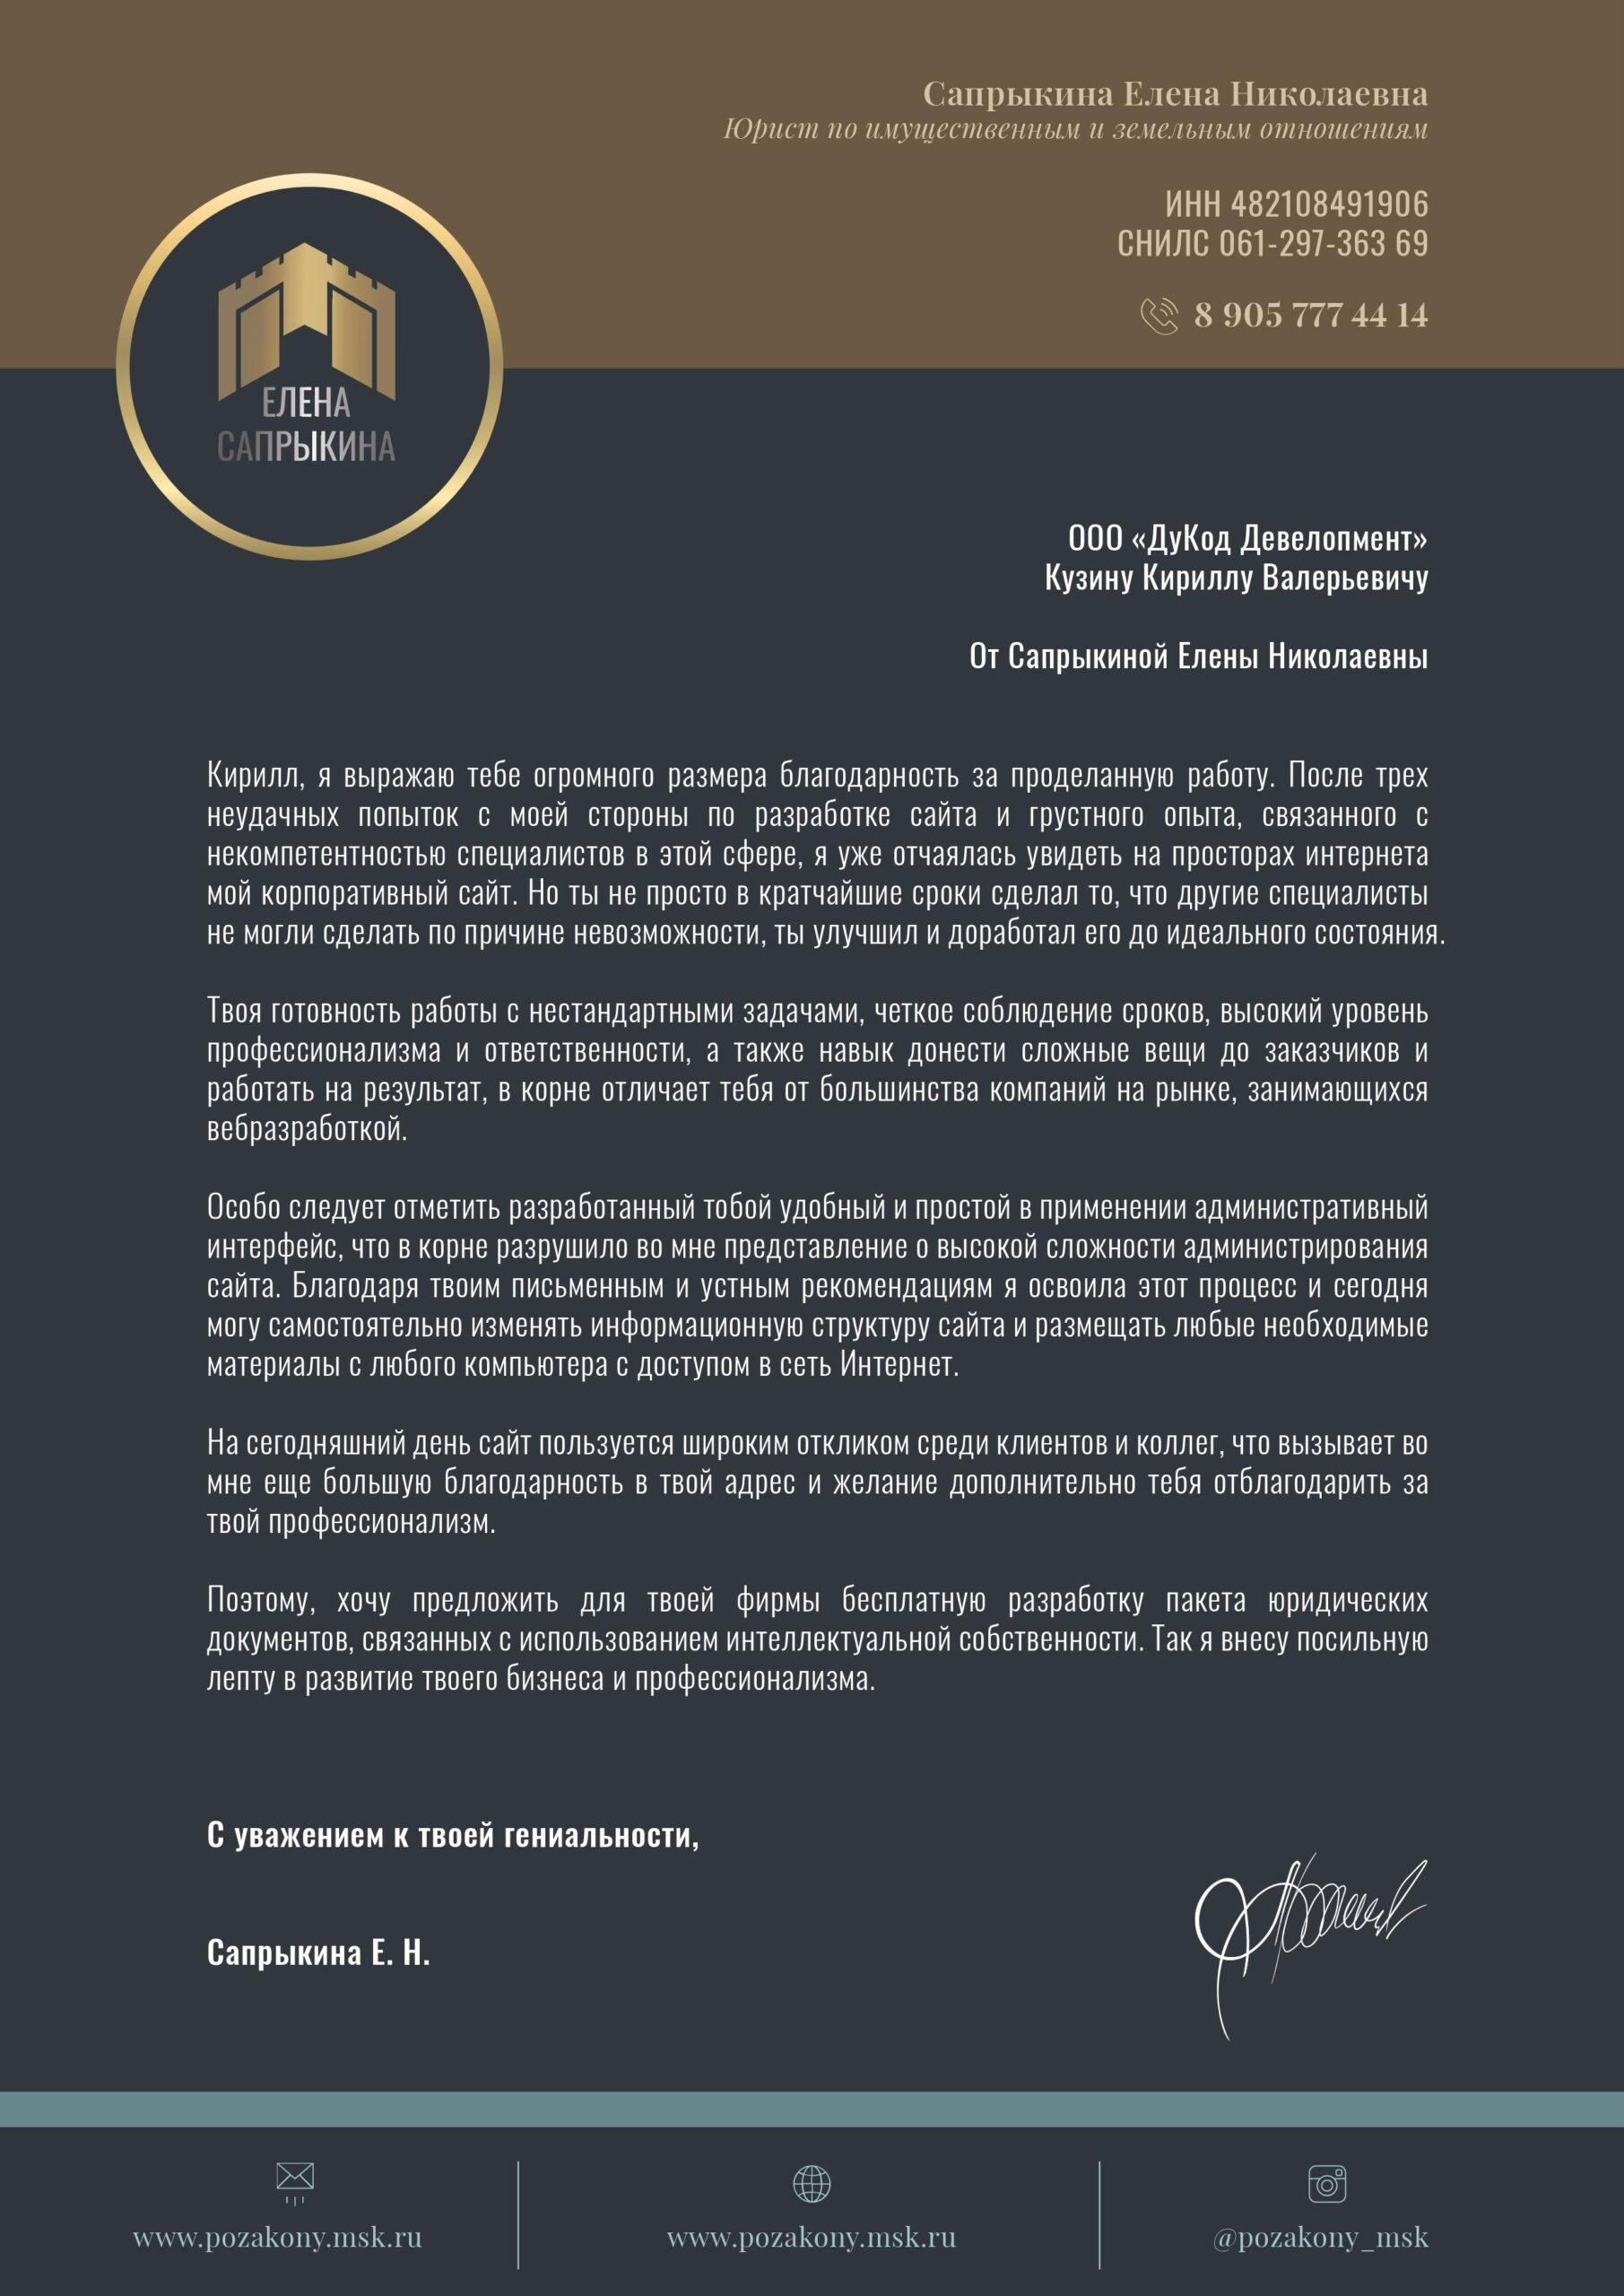 Отзыв DoCode DEV Елена Сапрыкина